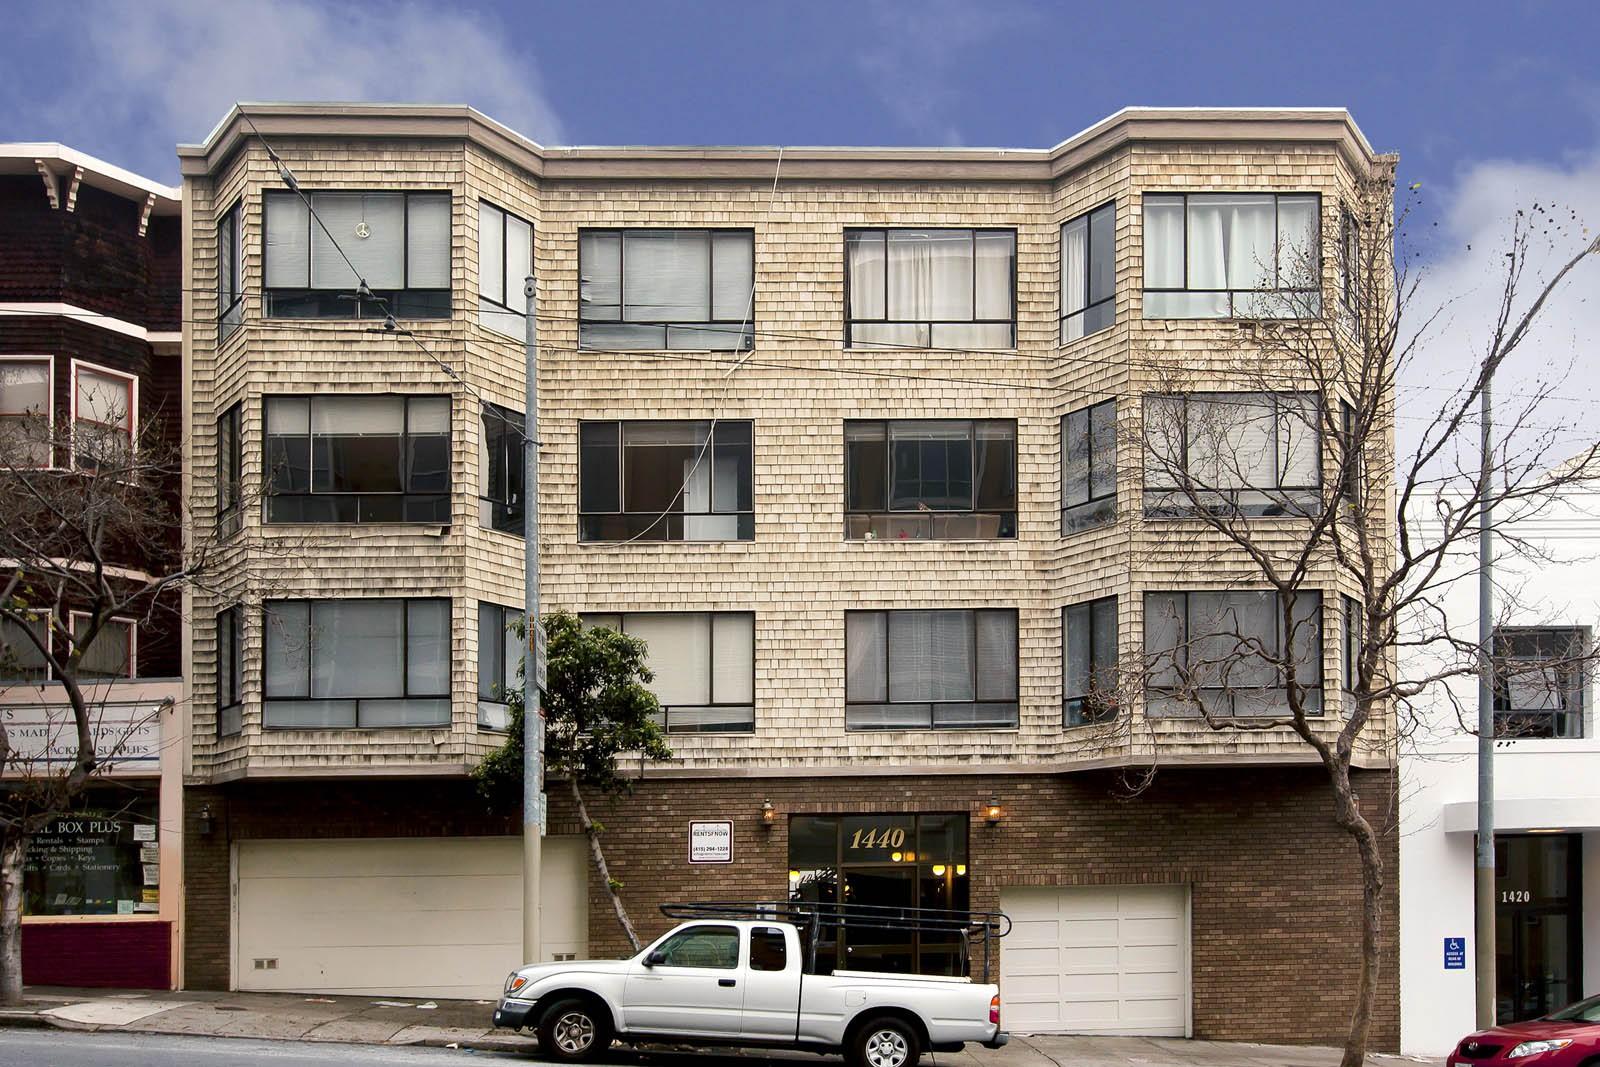 1440 SUTTER Apartments